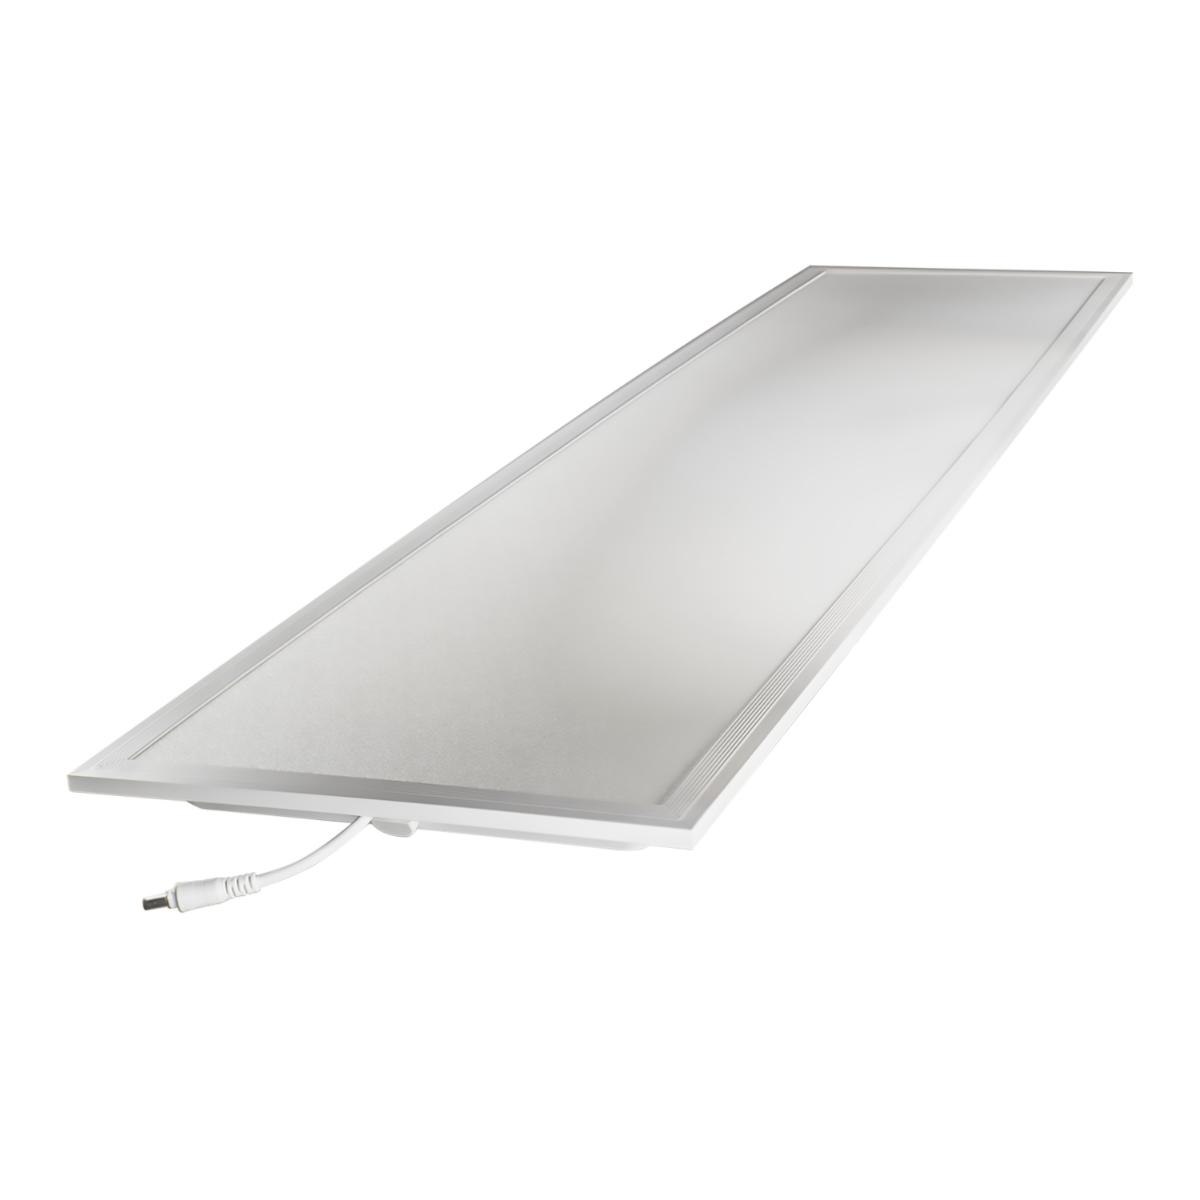 Noxion LED Paneel Delta Pro Highlum V2.0 Xitanium DALI 40W 30x120cm 4000K 5480lm UGR <19 | Dali Dimbaar - Vervanger voor 2x36W